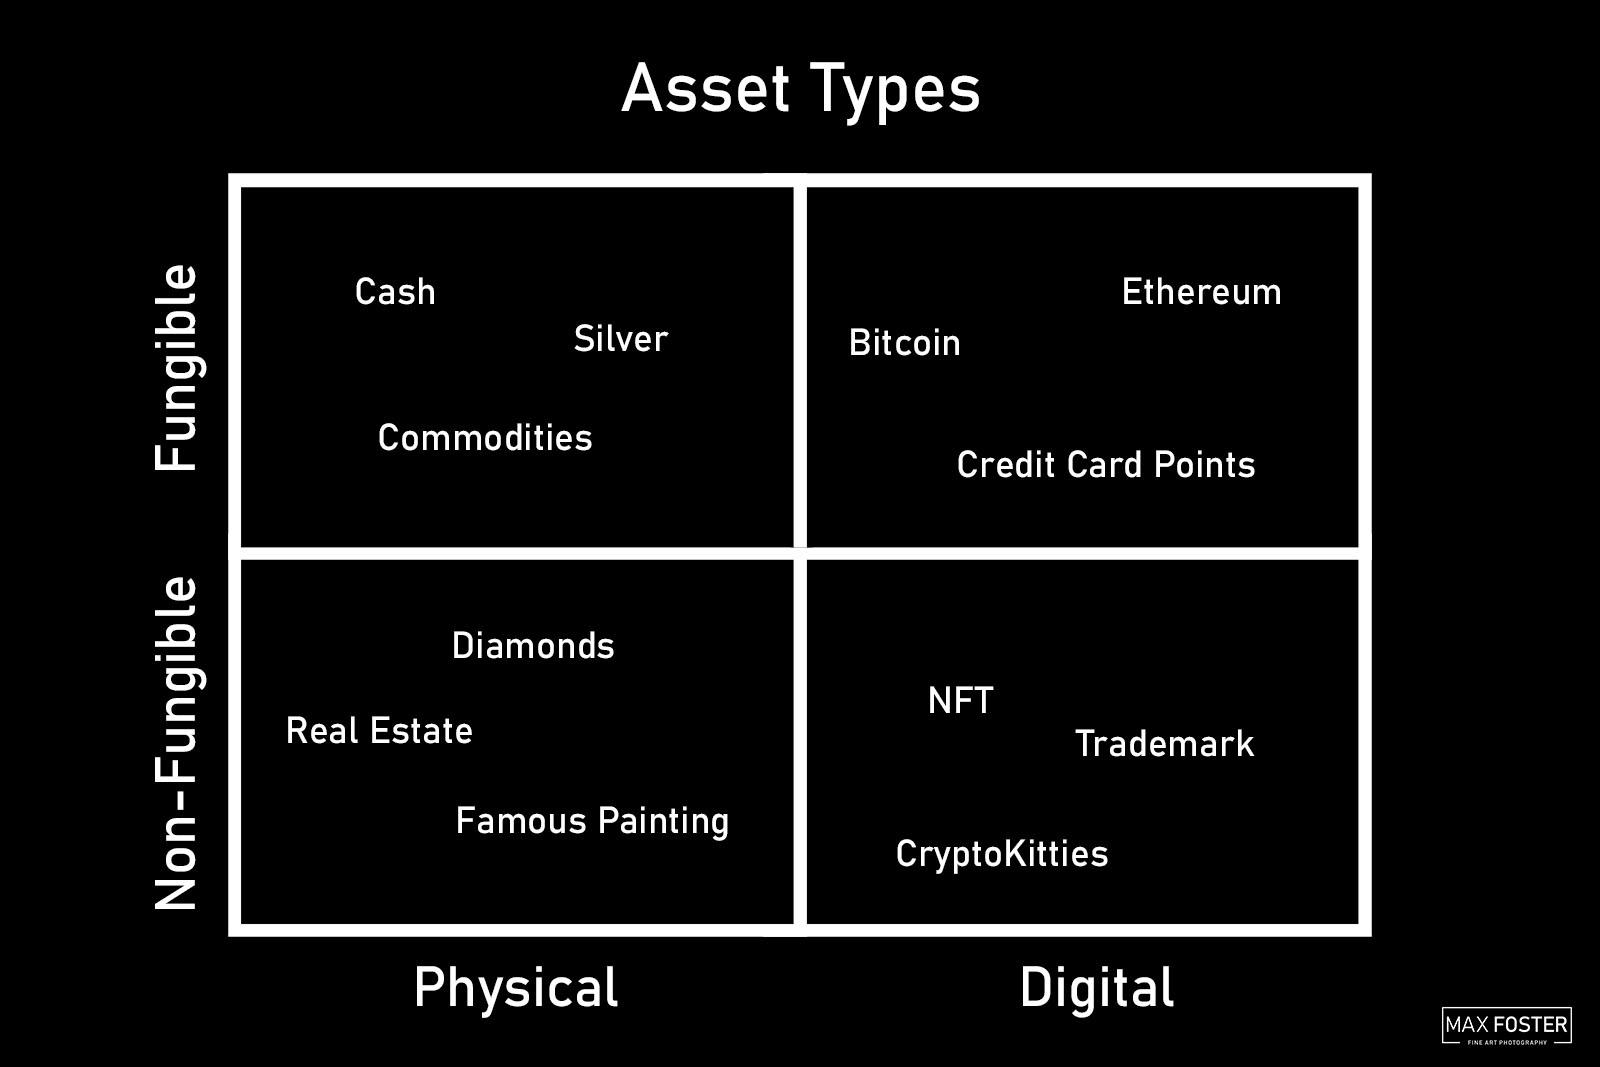 Asset Types Diagram